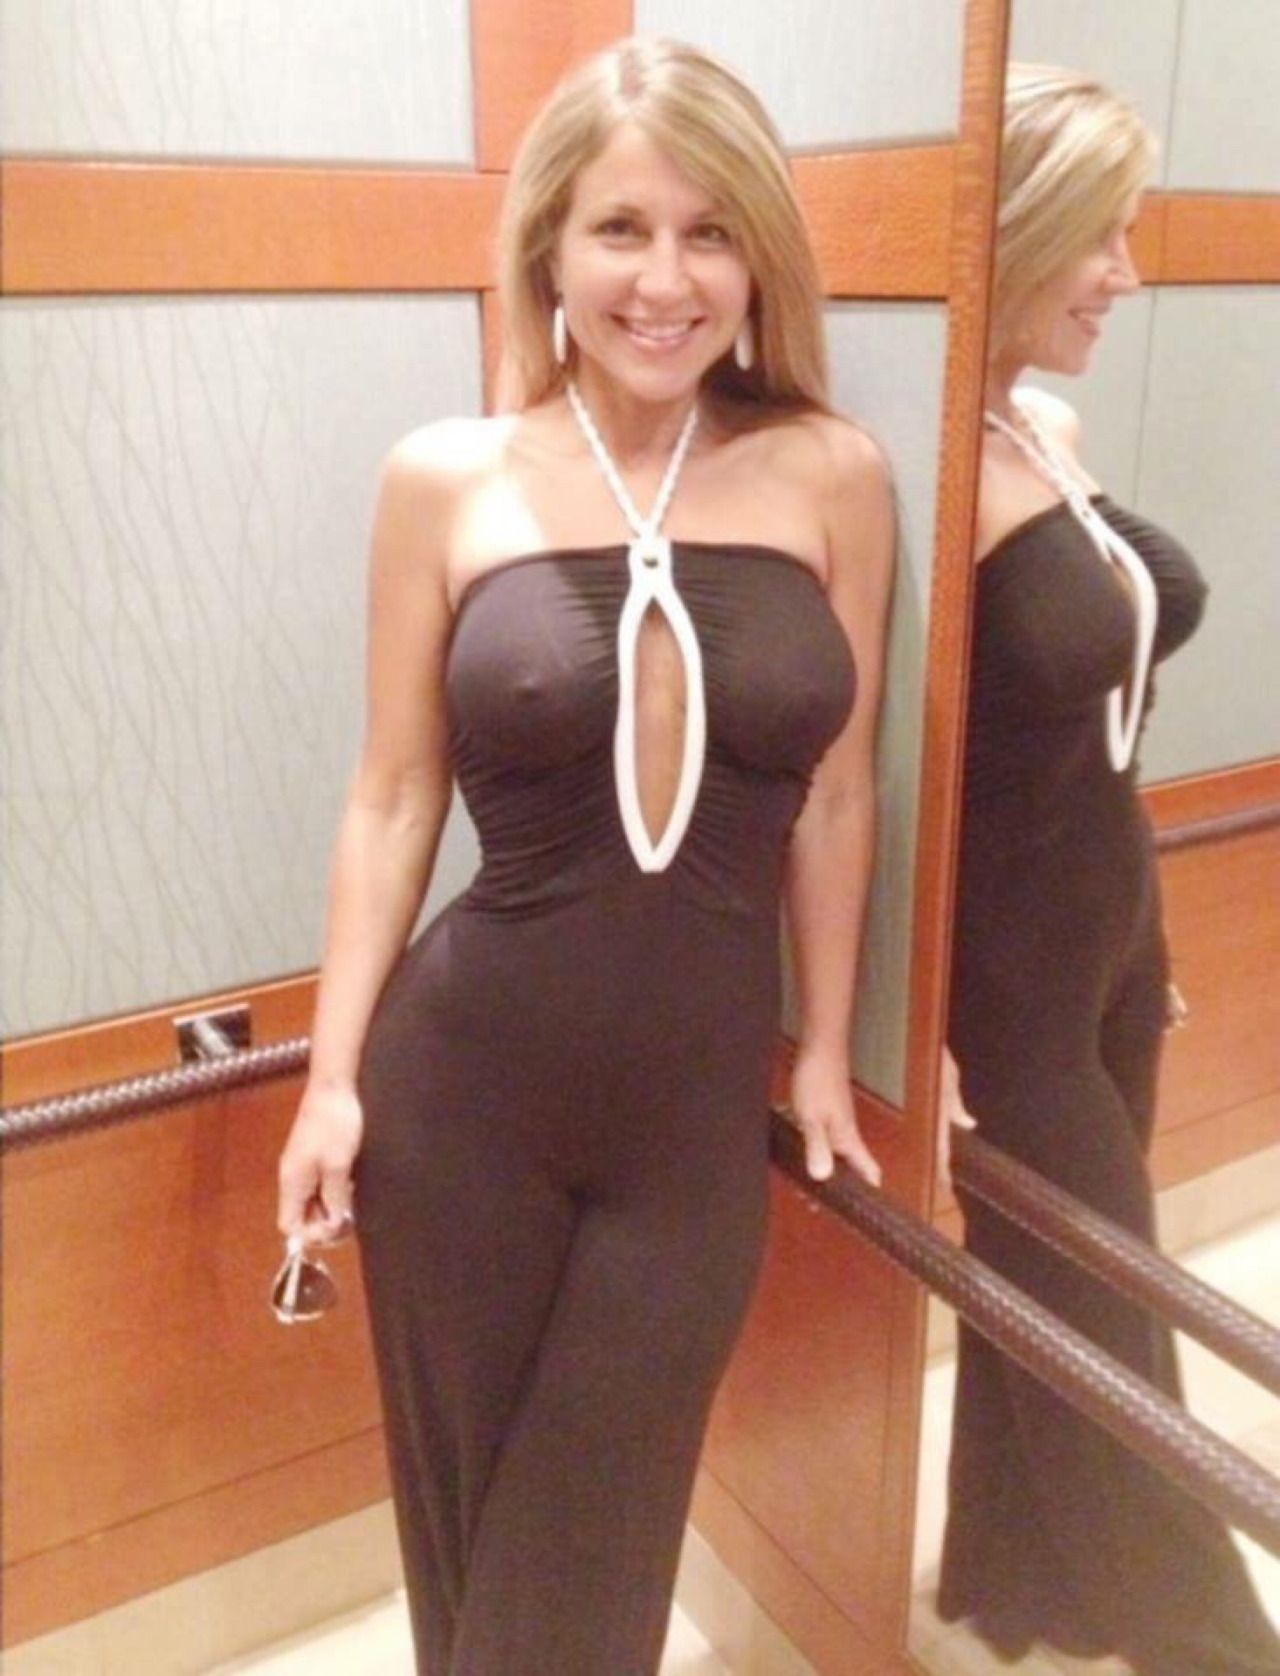 desi blouse tits flashes